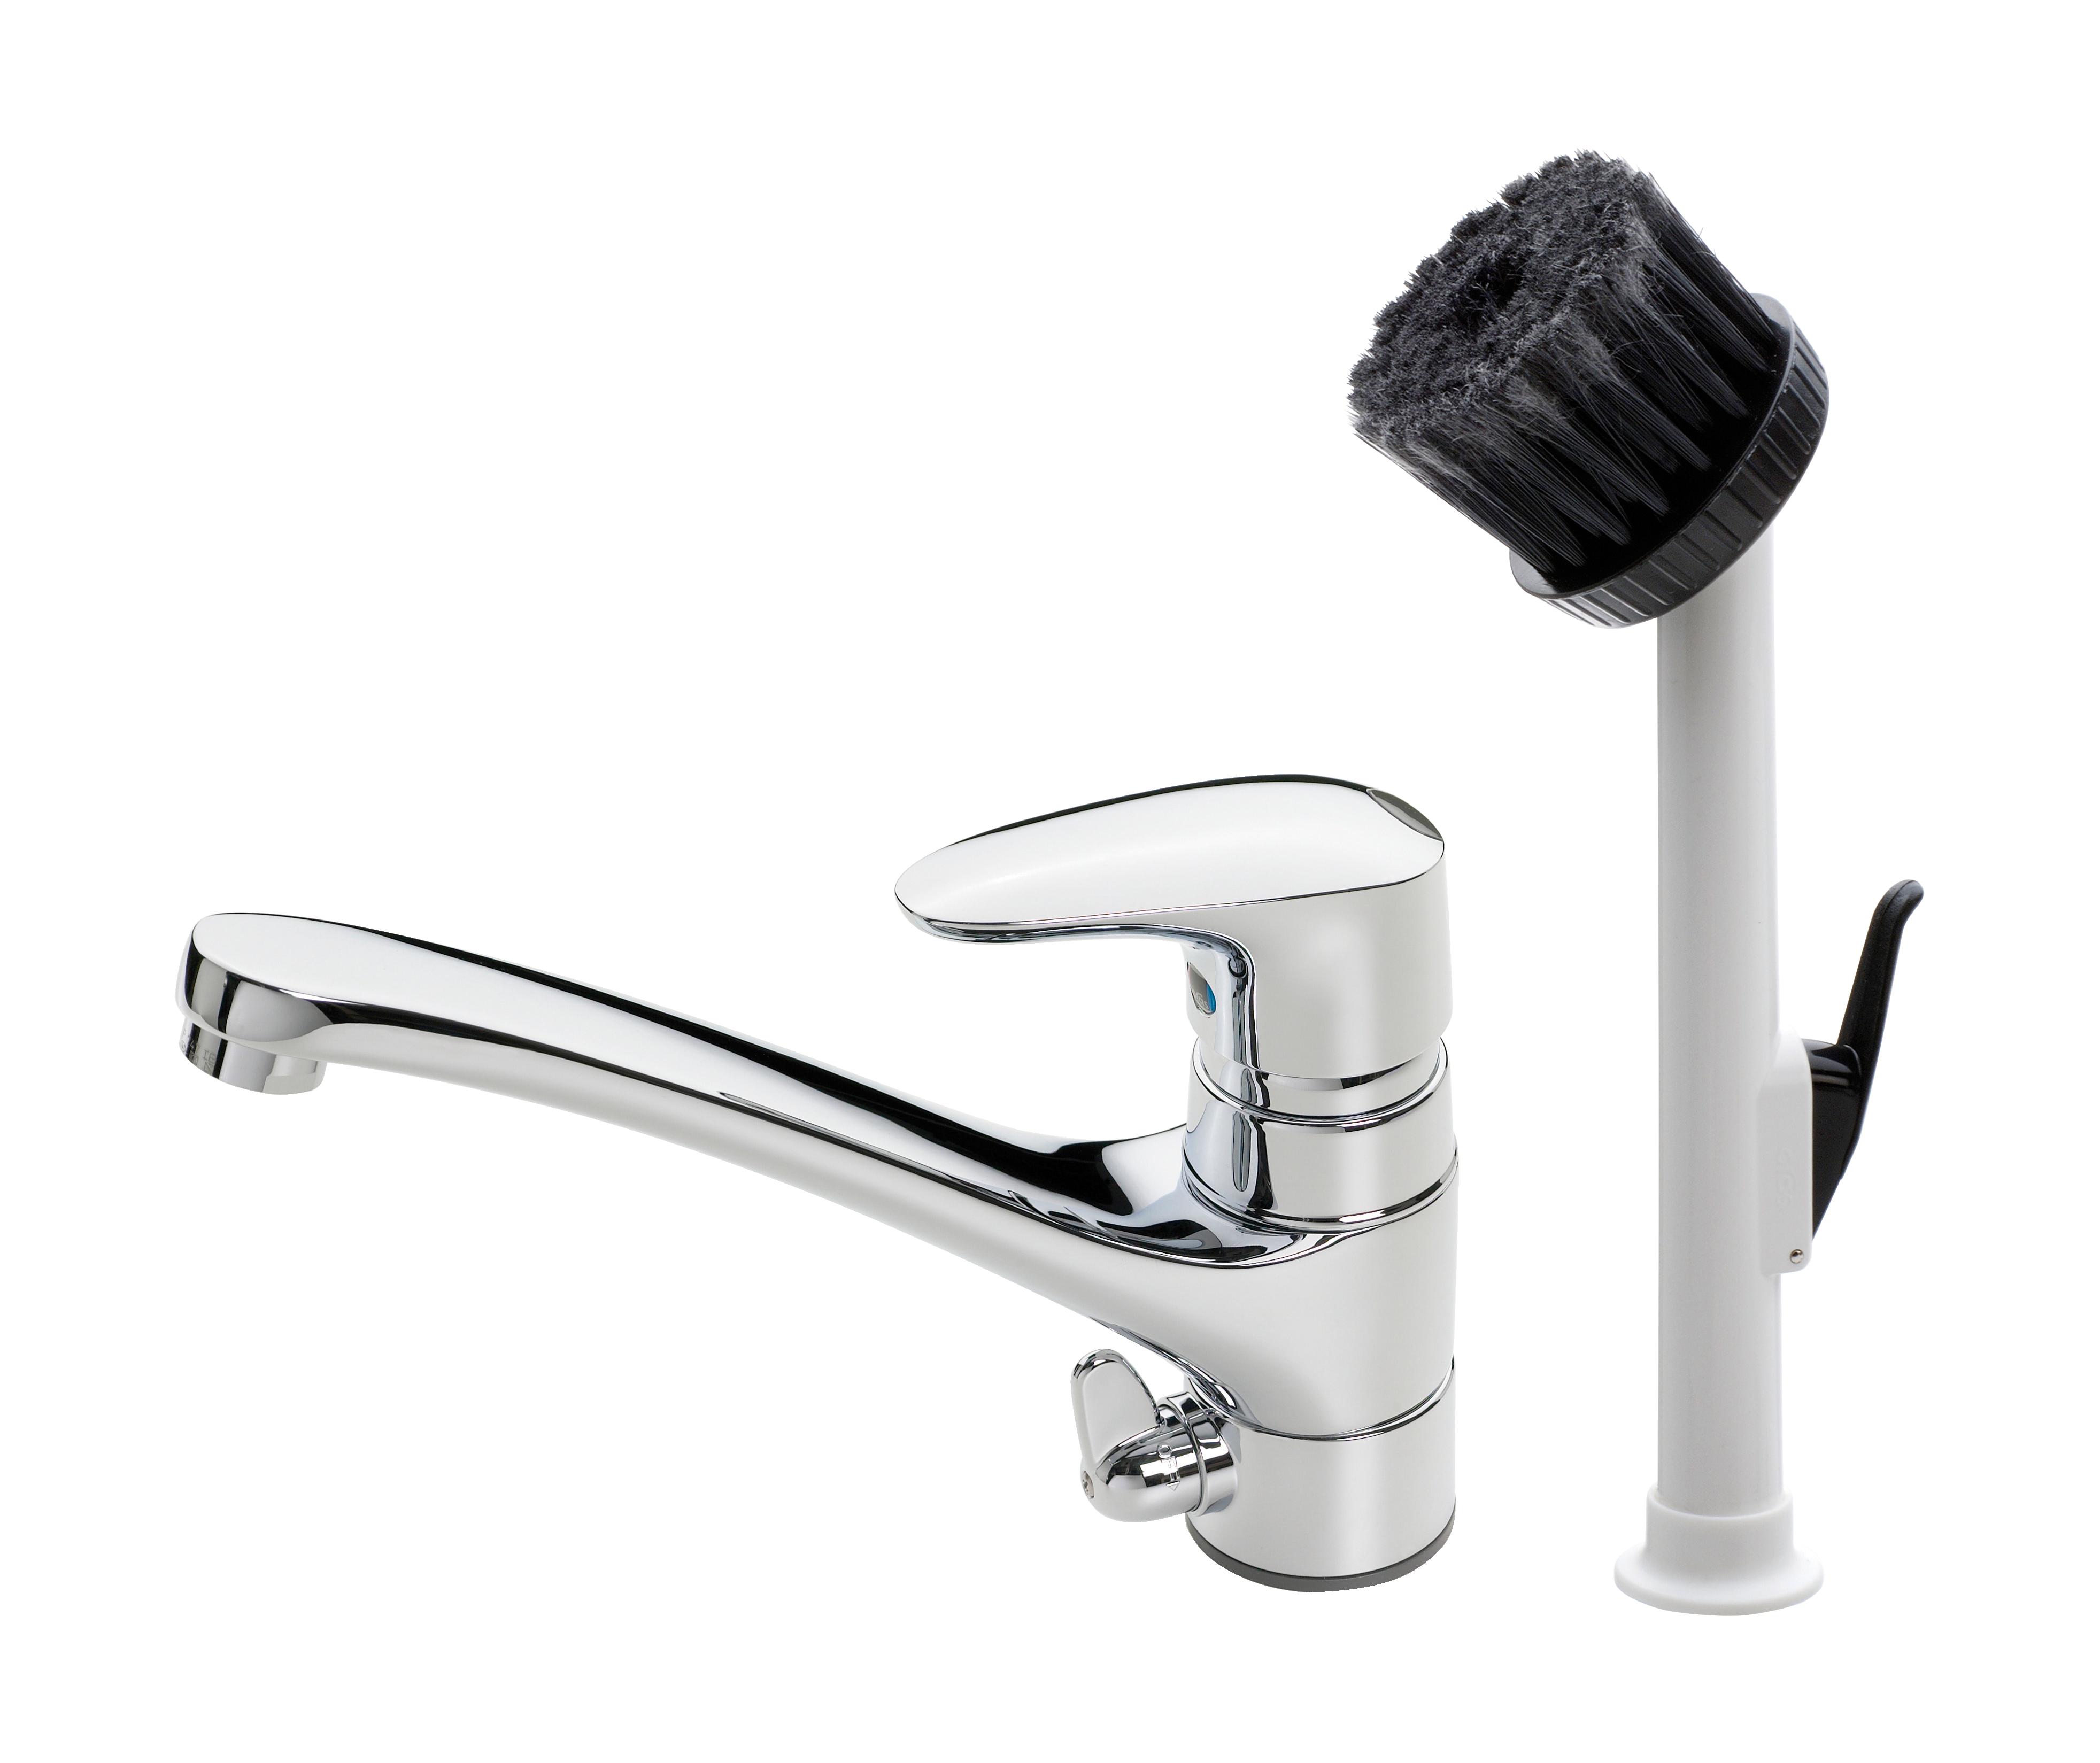 Oras Vega Tap Shower Set Utility Room Faucets